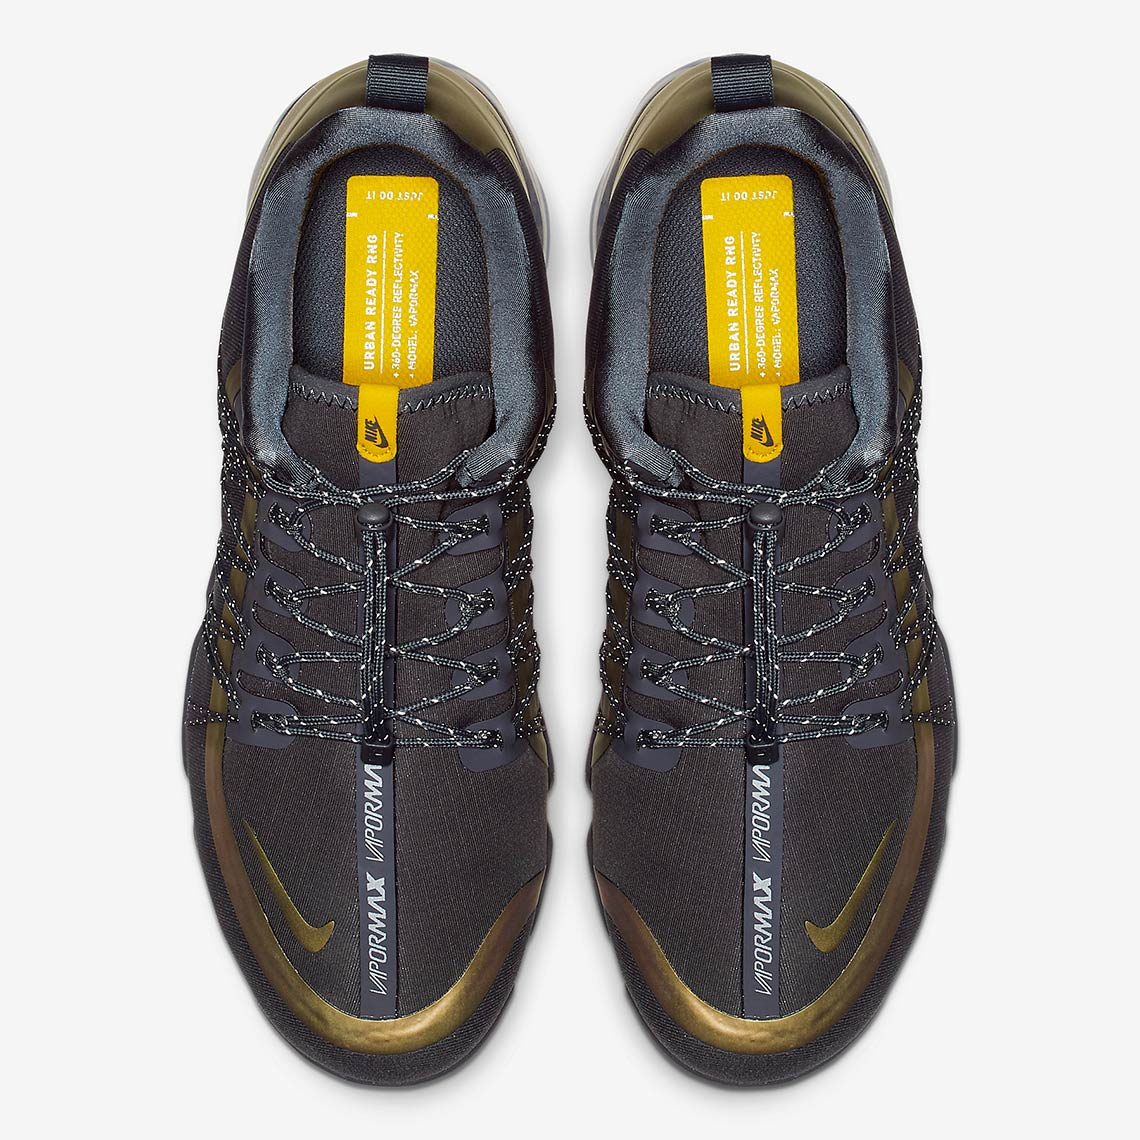 7542dd76f35 Nike Vapormax Run Utility AQ8810-008 Release Date